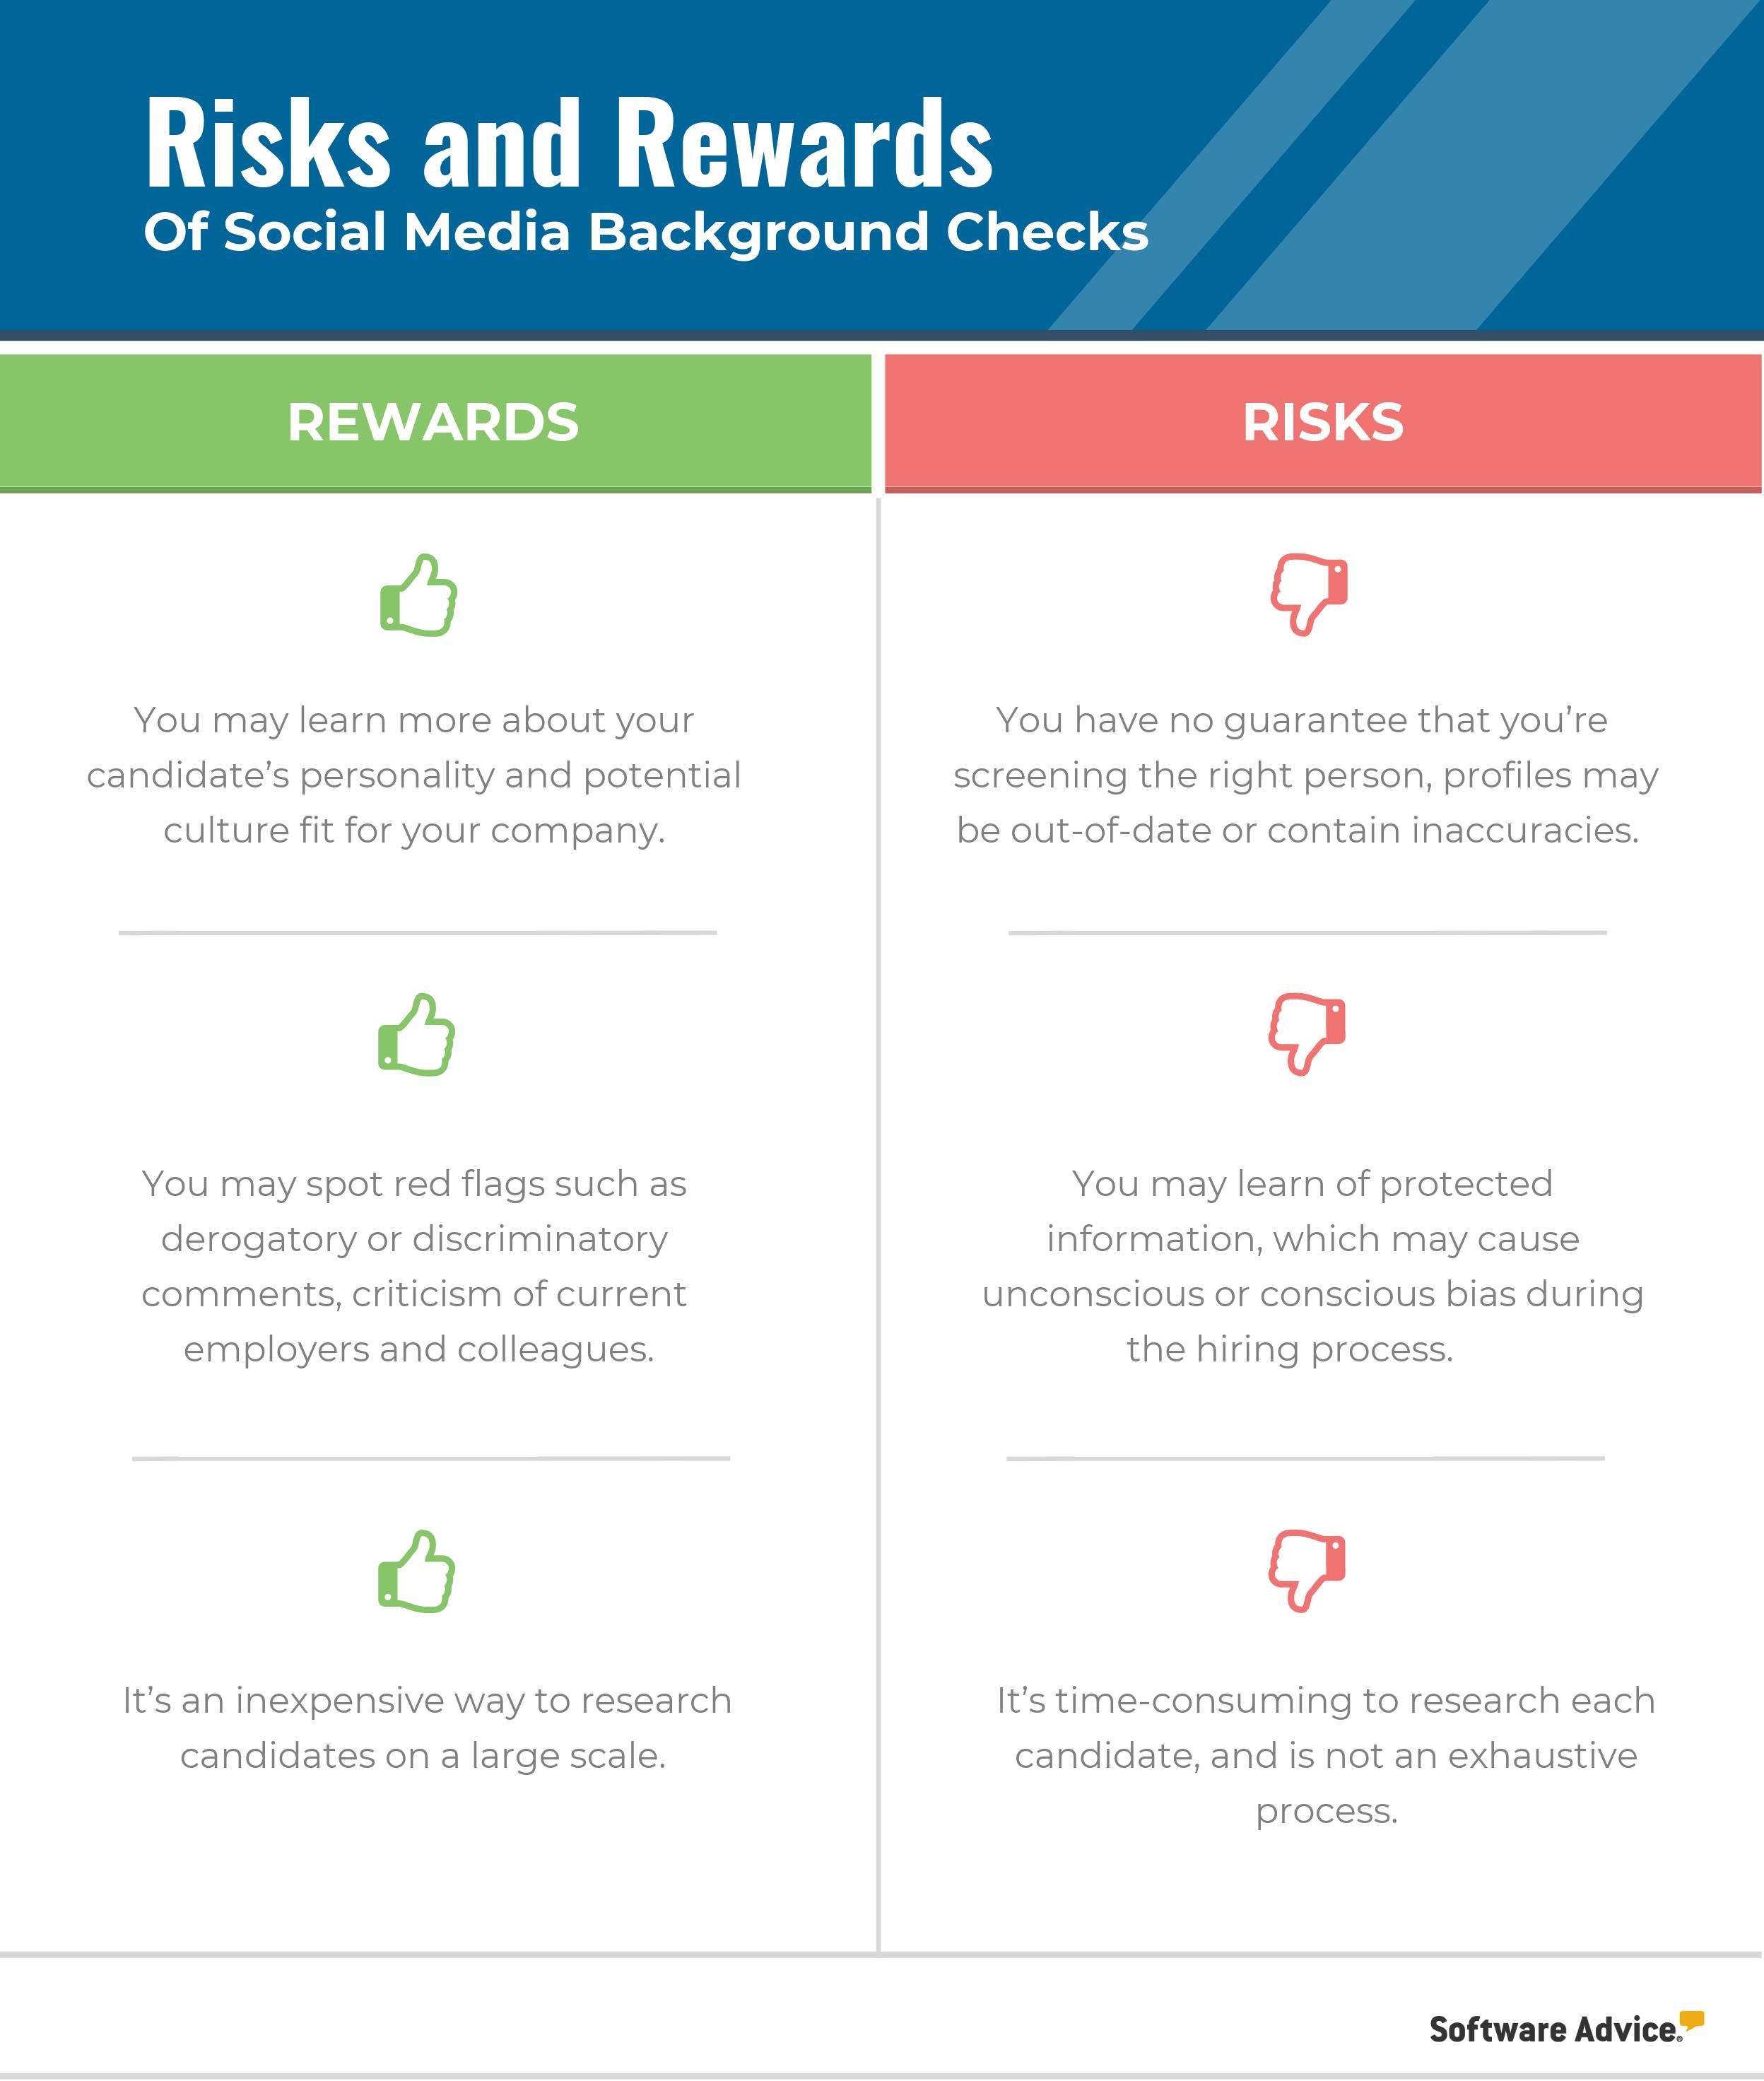 risks and rewards of social media background checks